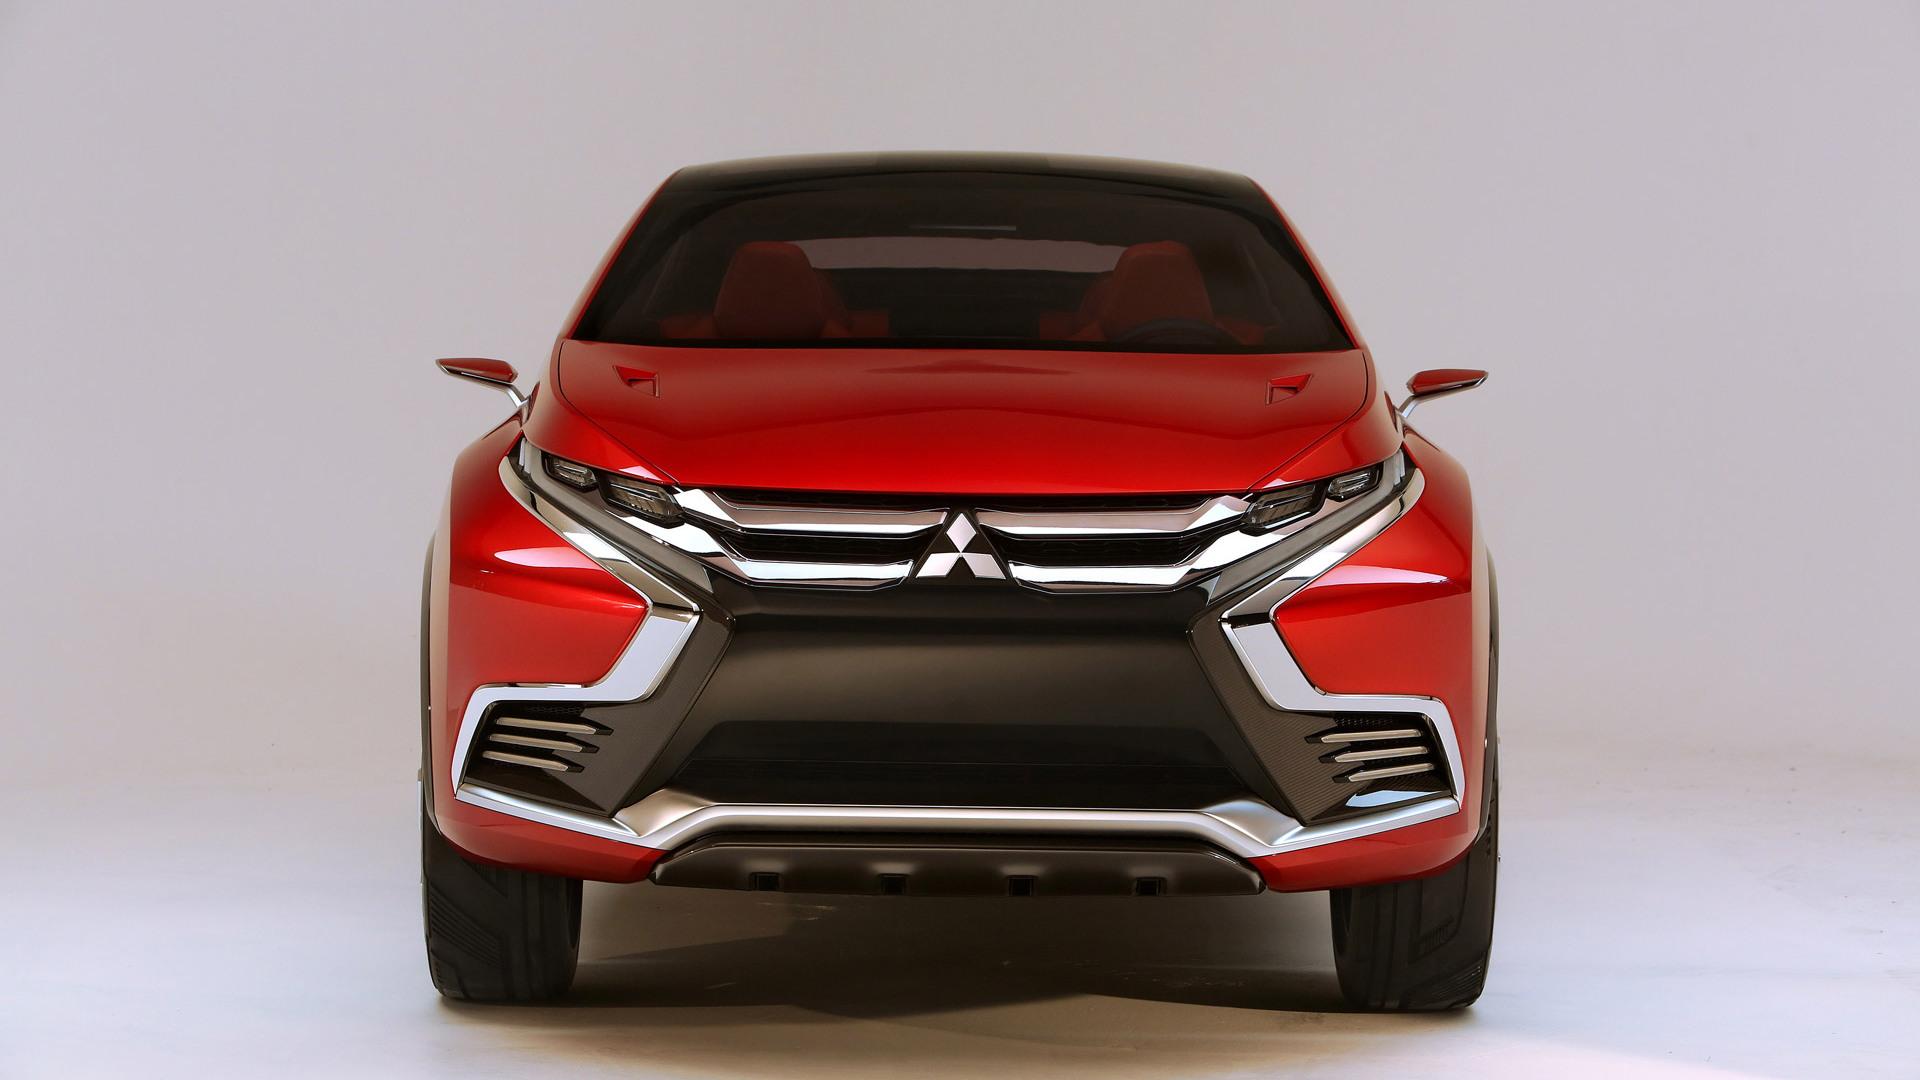 Mitsubishi XR-PHEV II concept, 2015 Geneva Motor Show